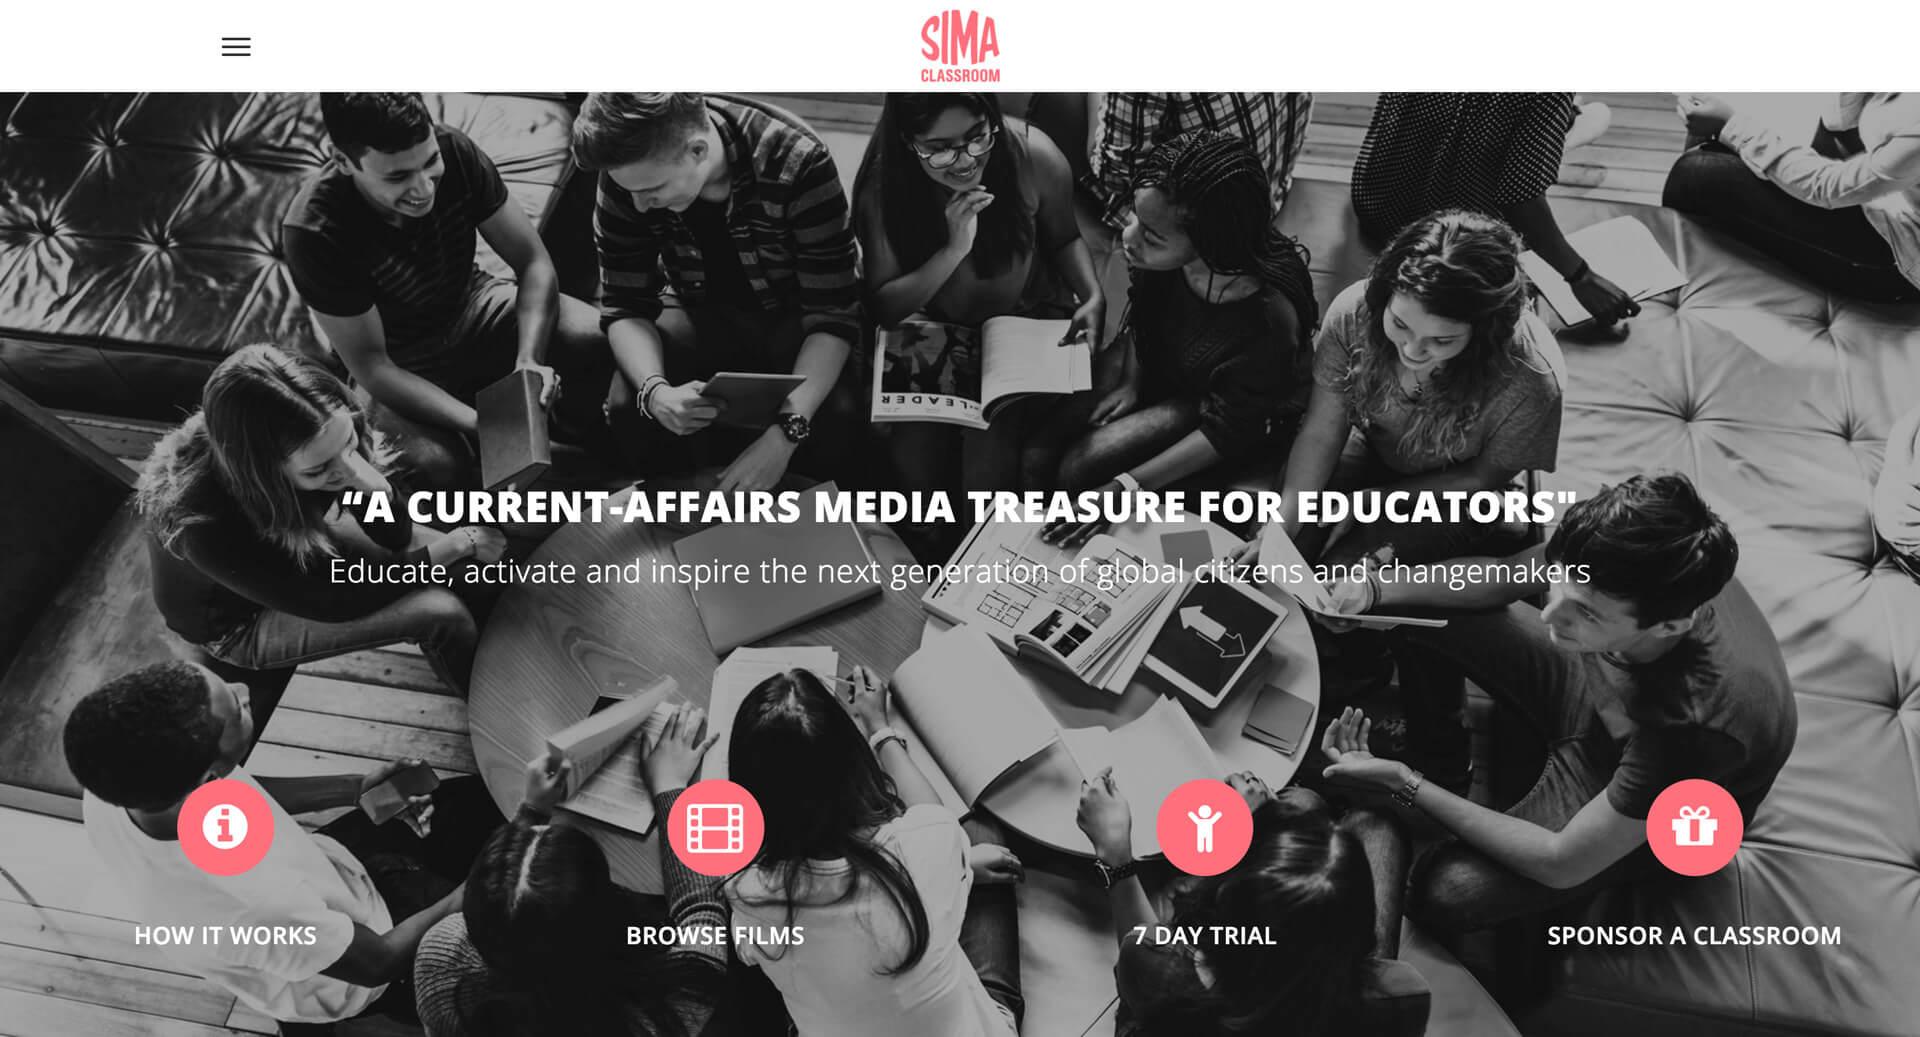 sima-classroom-cover.jpg